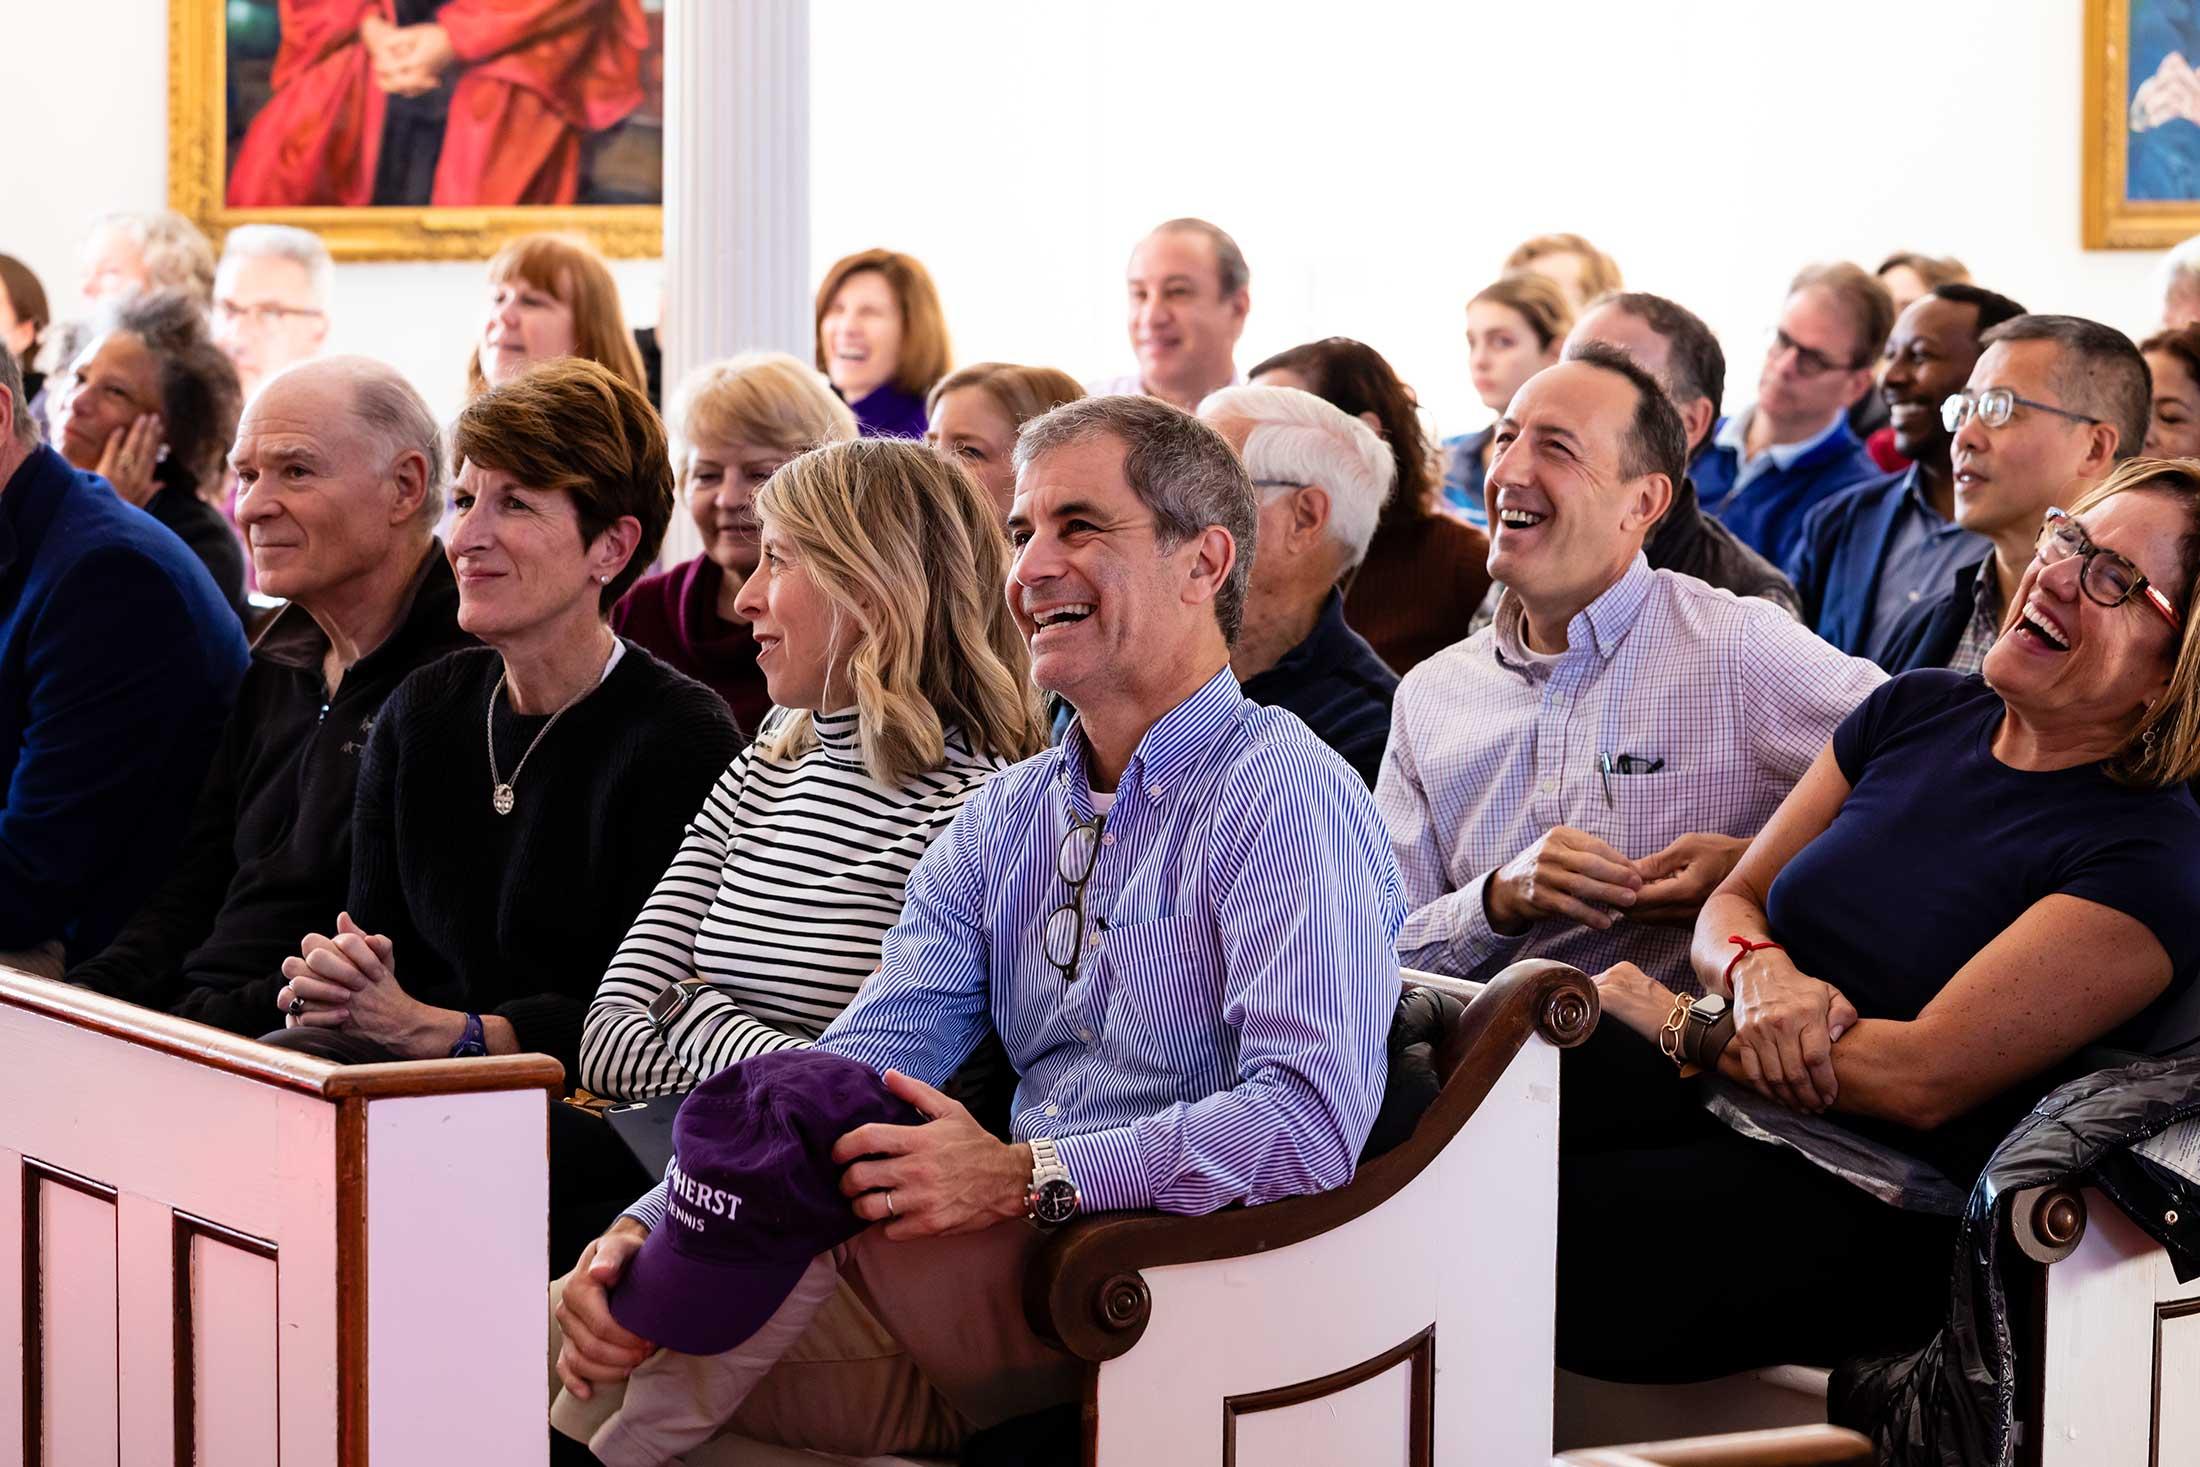 Audience members listening to President Martin speka